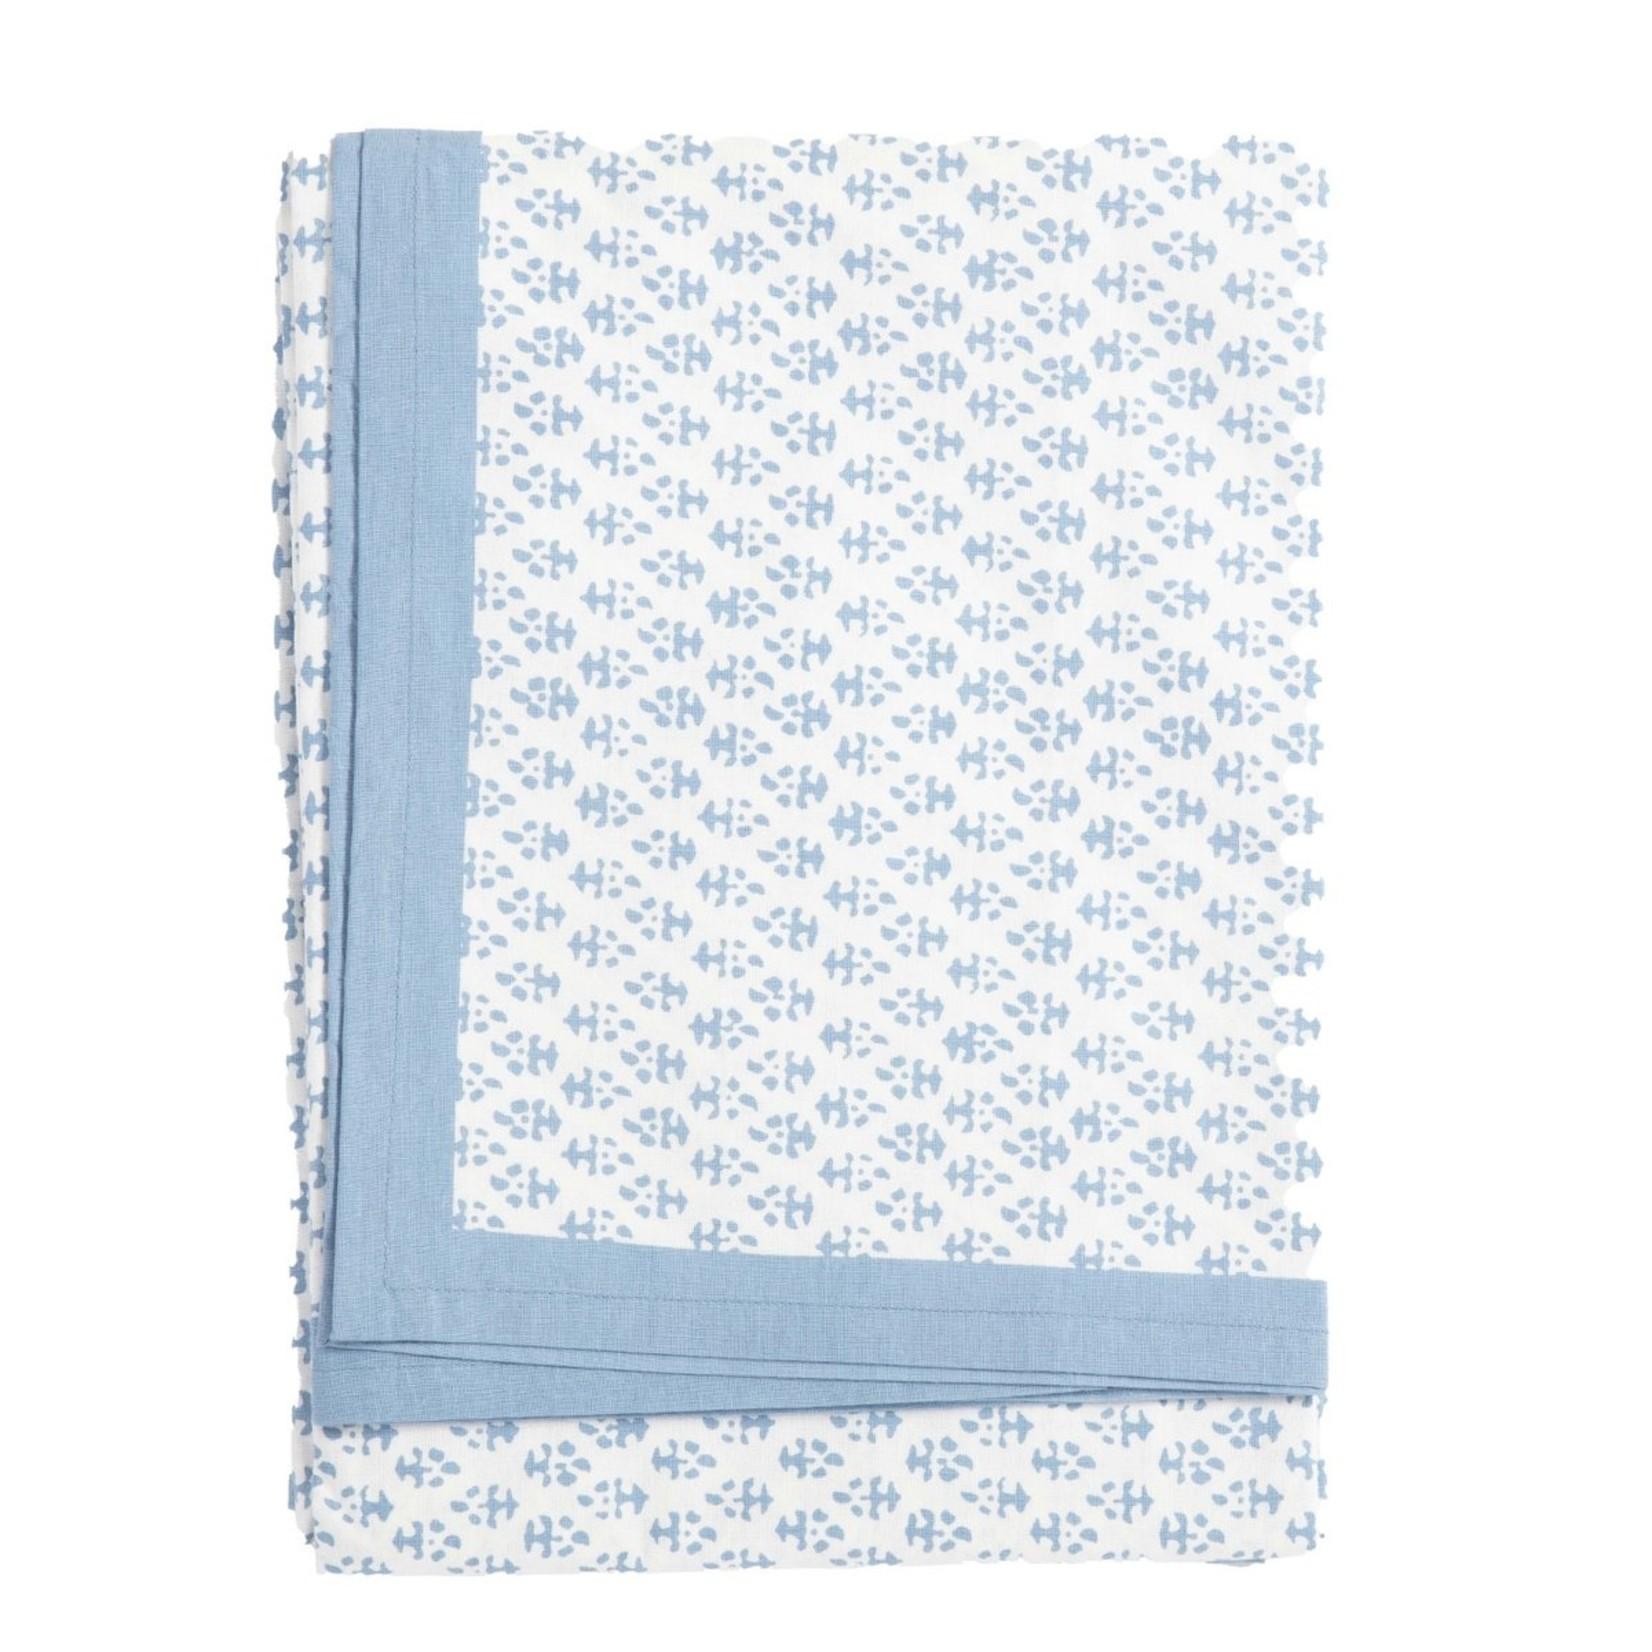 Amanda Lindroth Hand-Blocked Batik Tablecloth